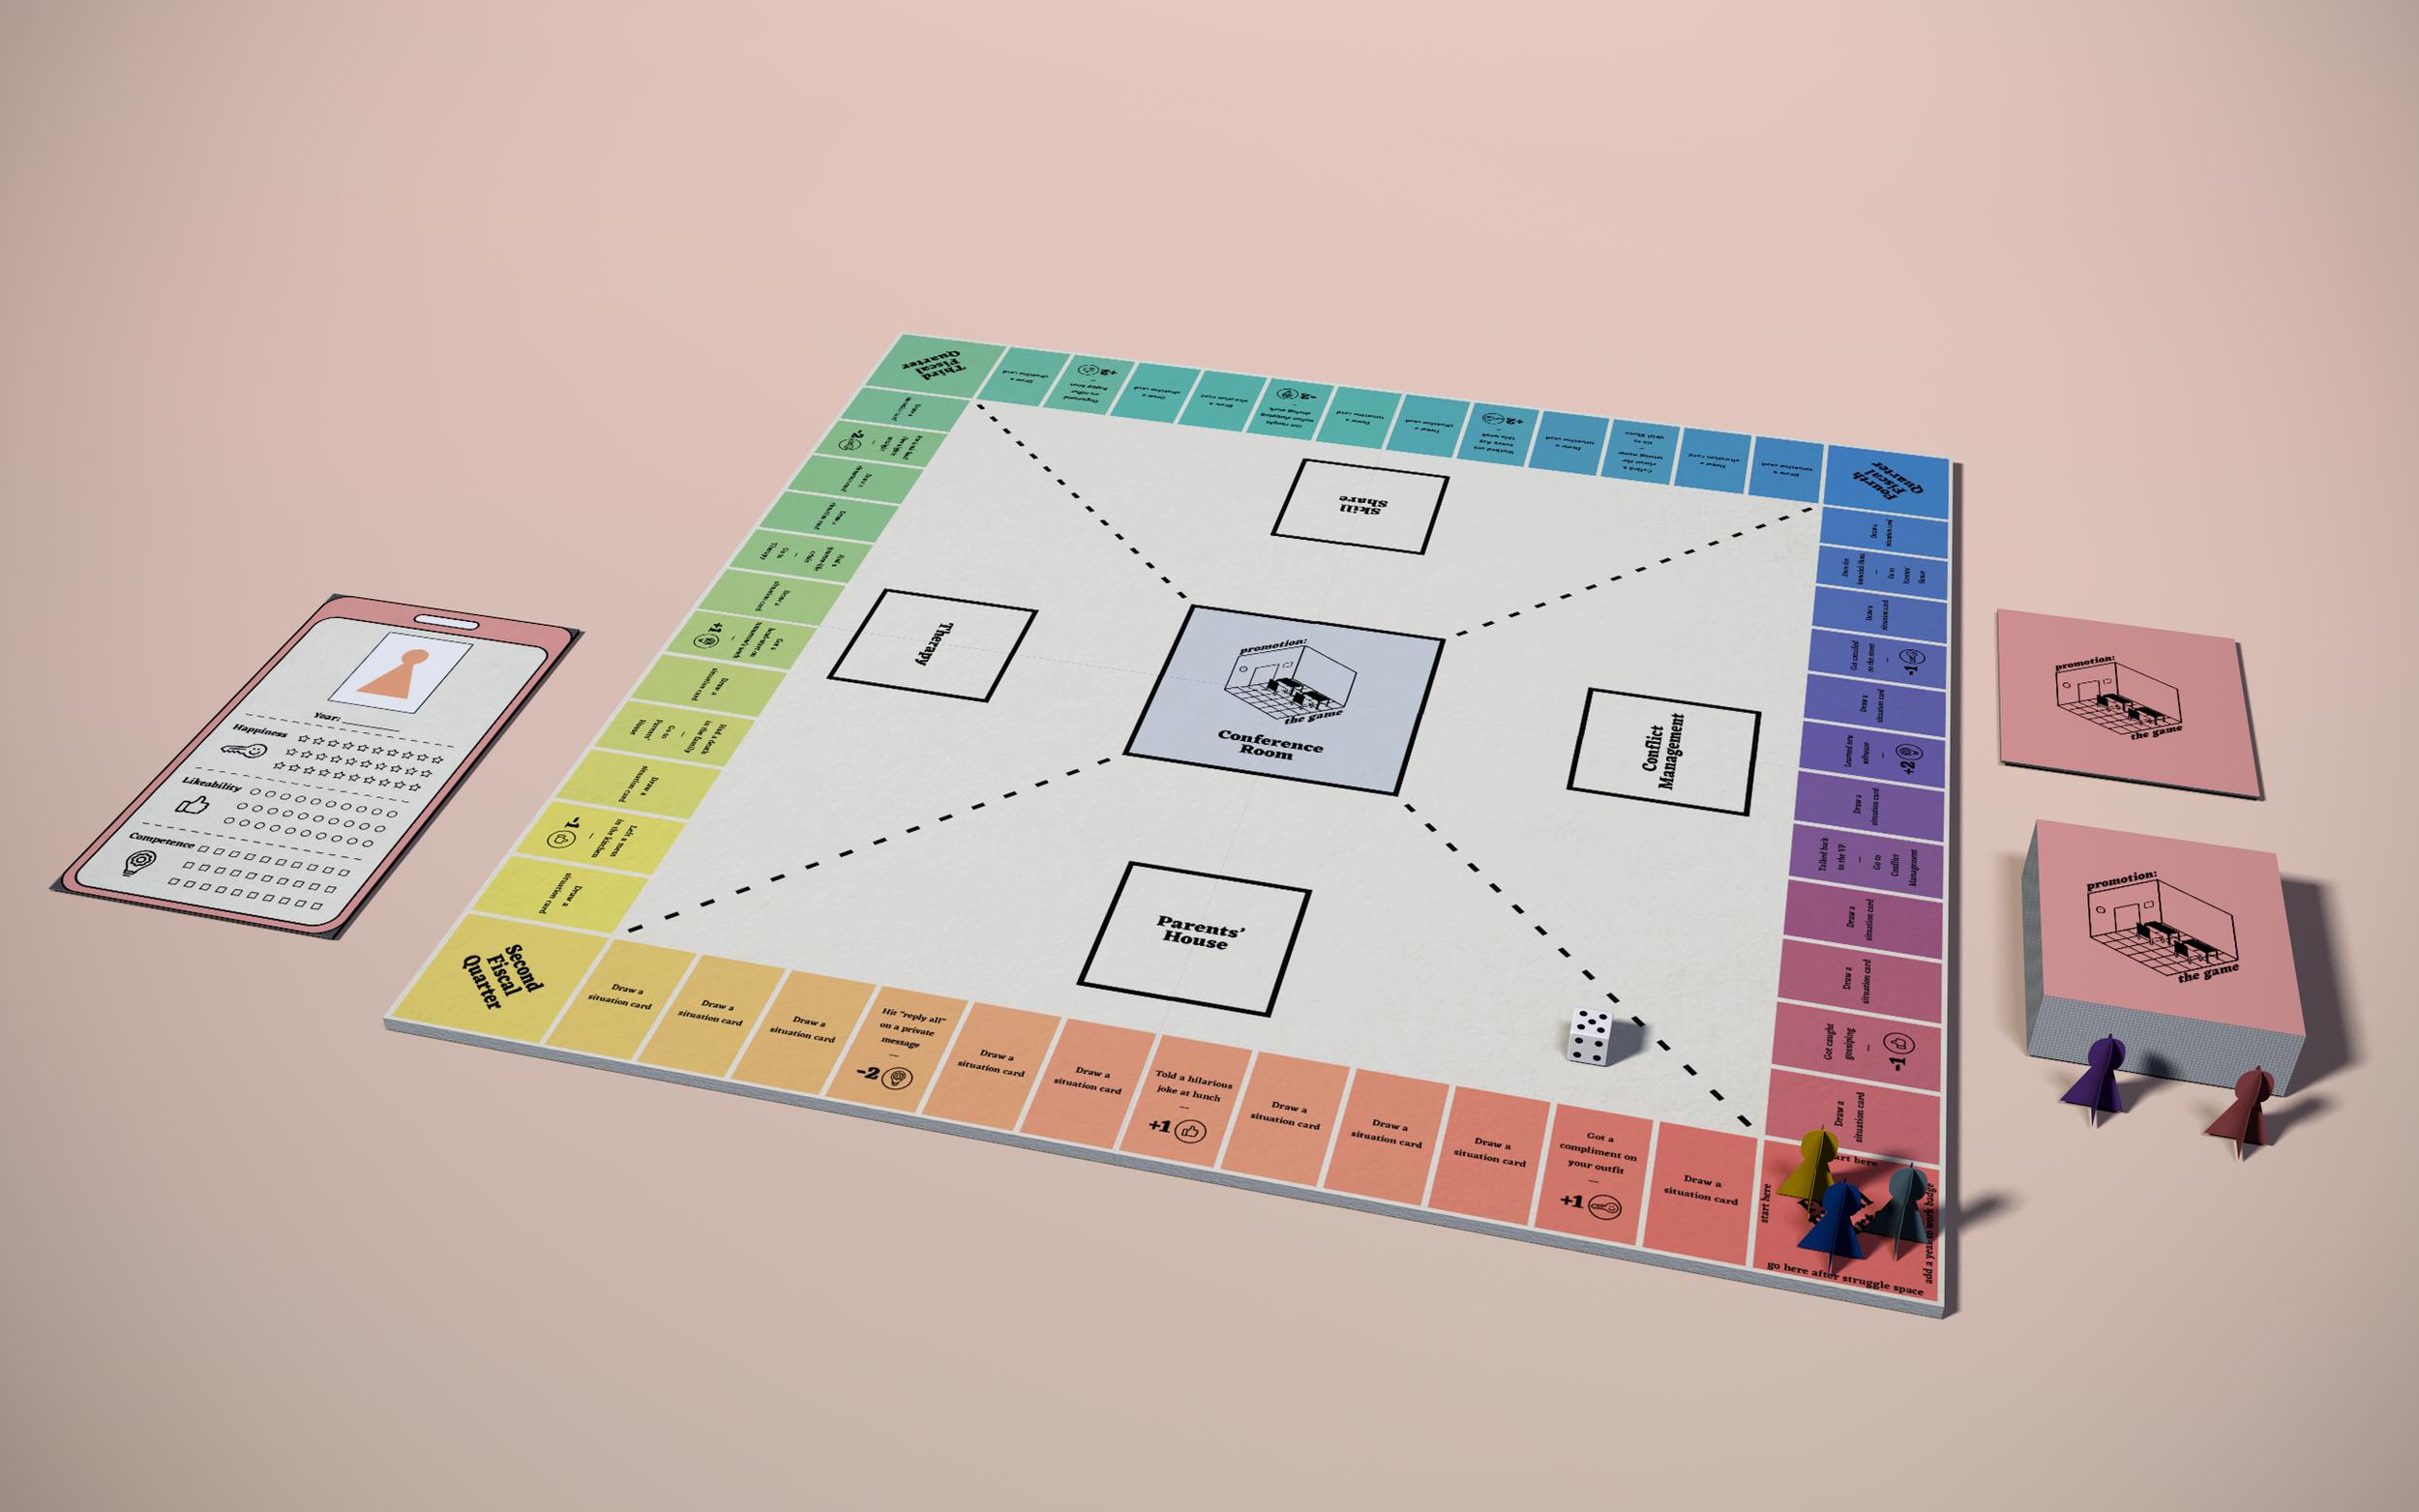 boardgame_render1.png